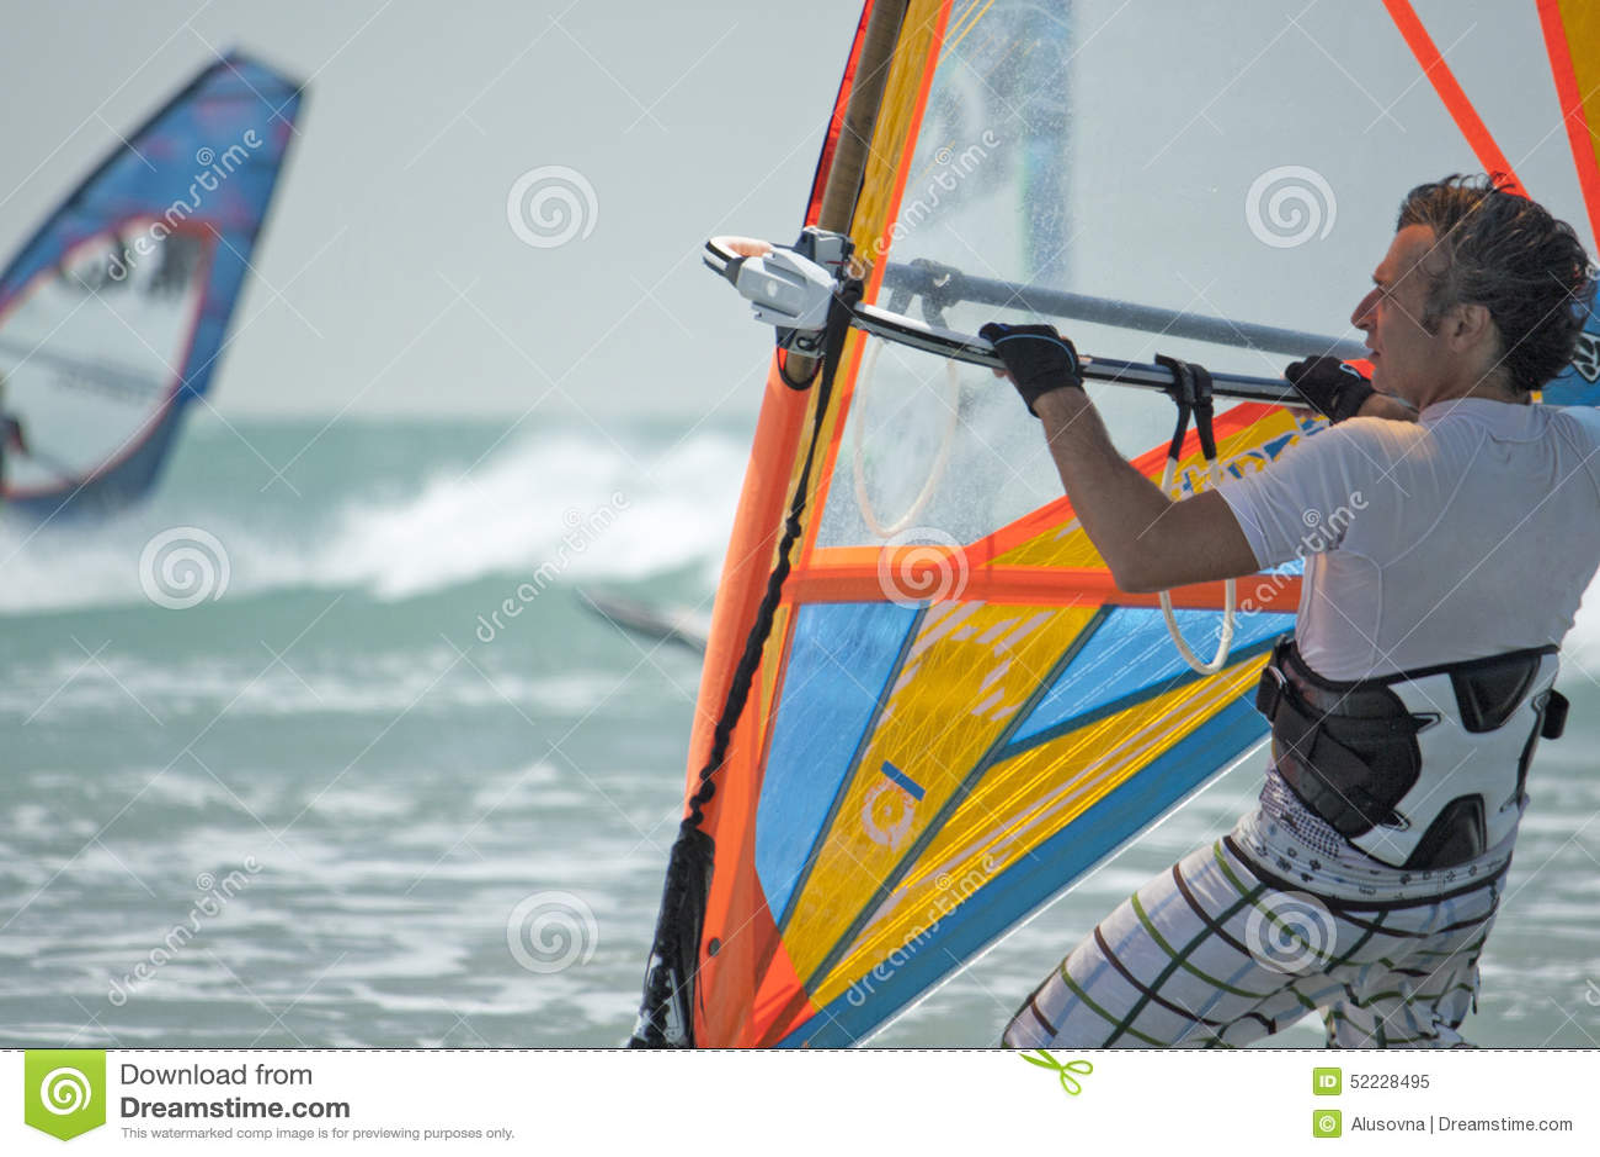 Windsurf Men Adult In Ocean Stock Image - Image of jumping